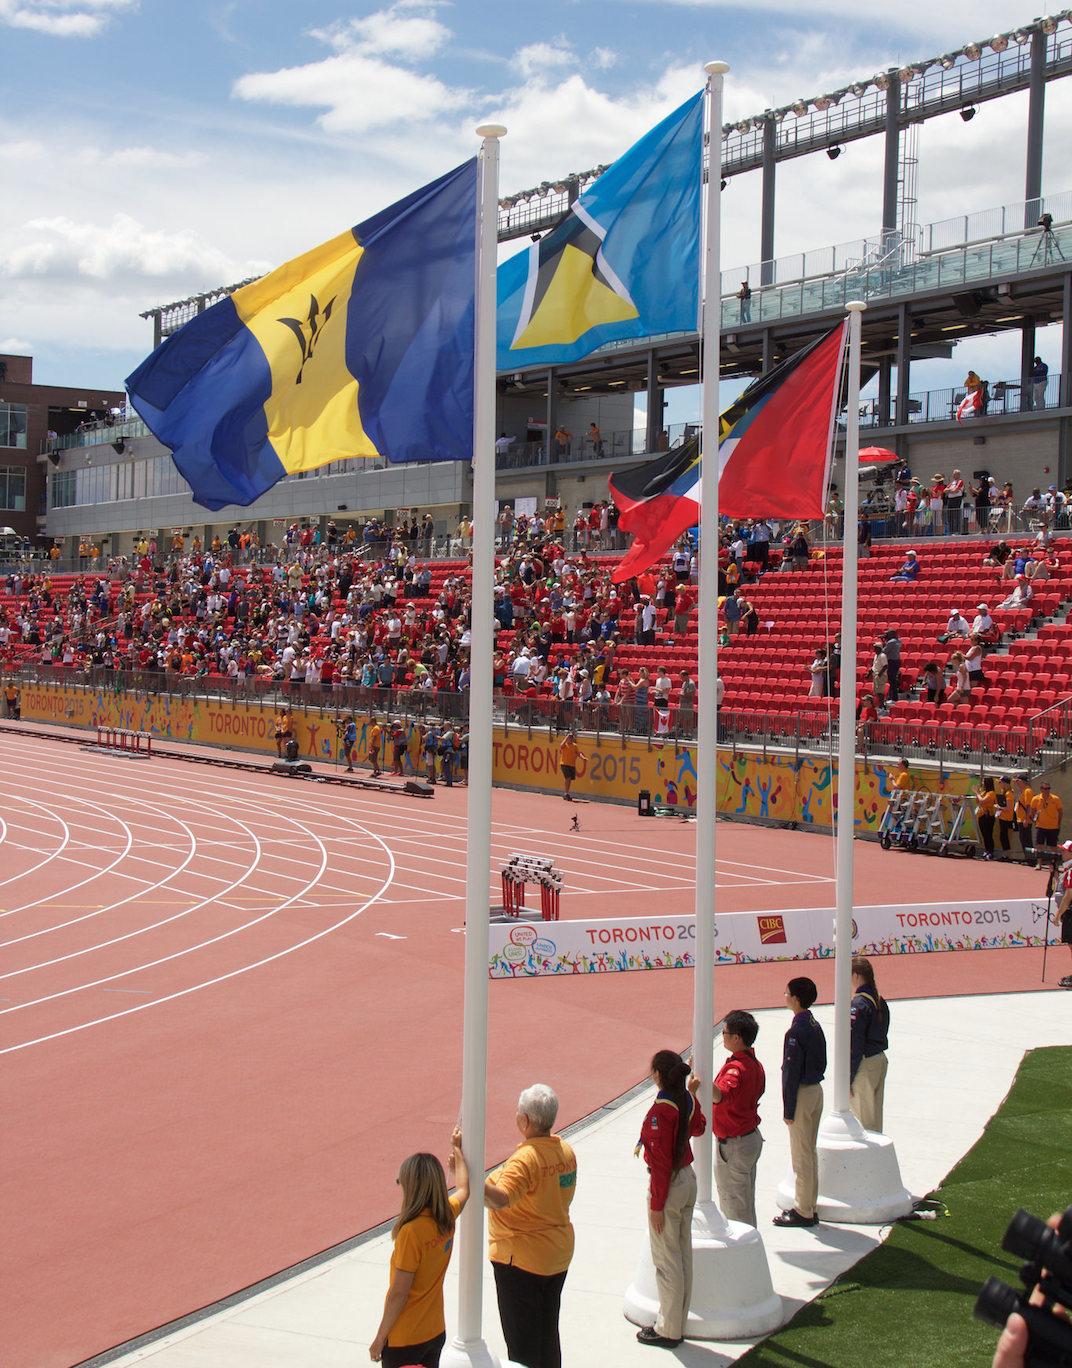 York Lions Stadium Toronto